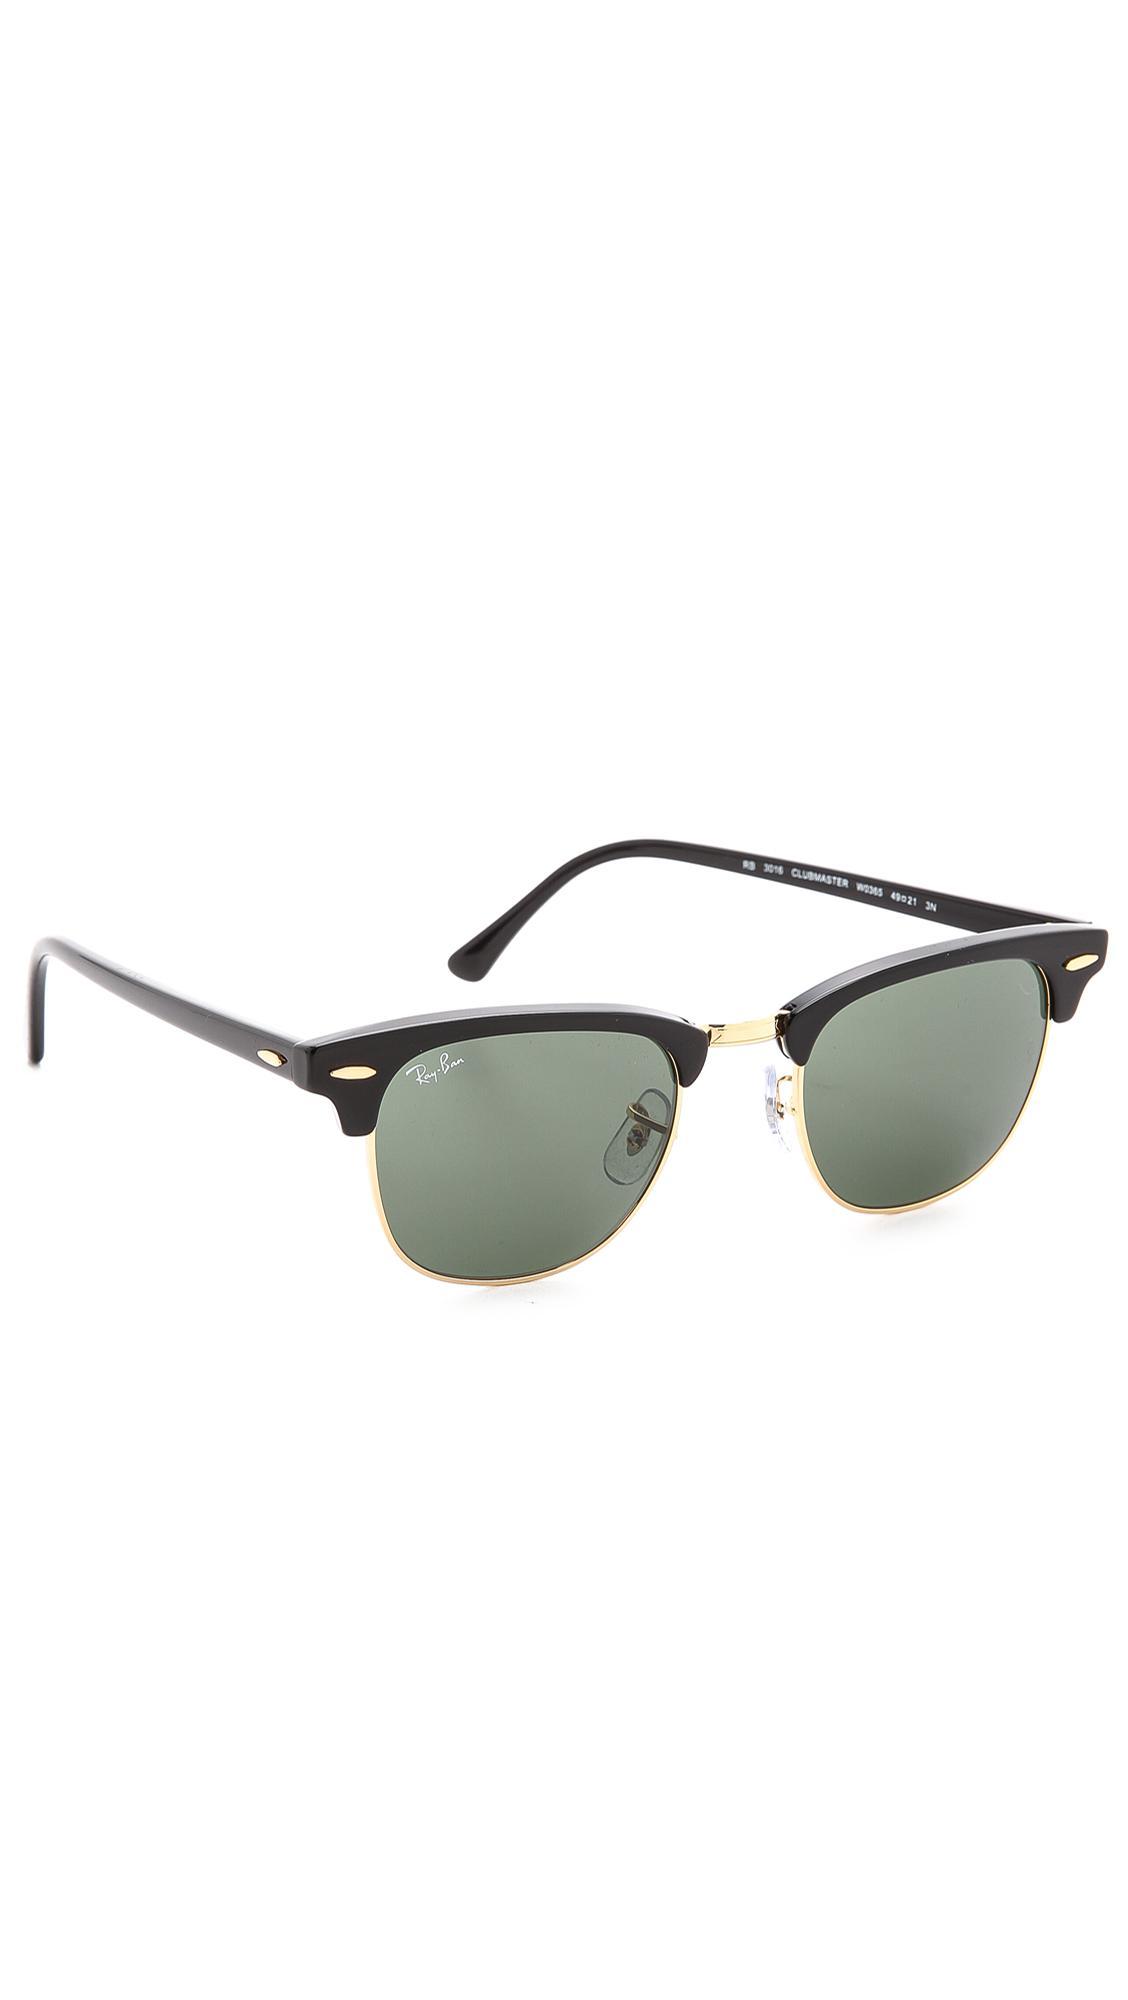 ... spain ray ban. mens black clubmaster classic sunglasses 2c29f 65e05  czech ray ban clubmaster rb3016 ... 758102f6fb